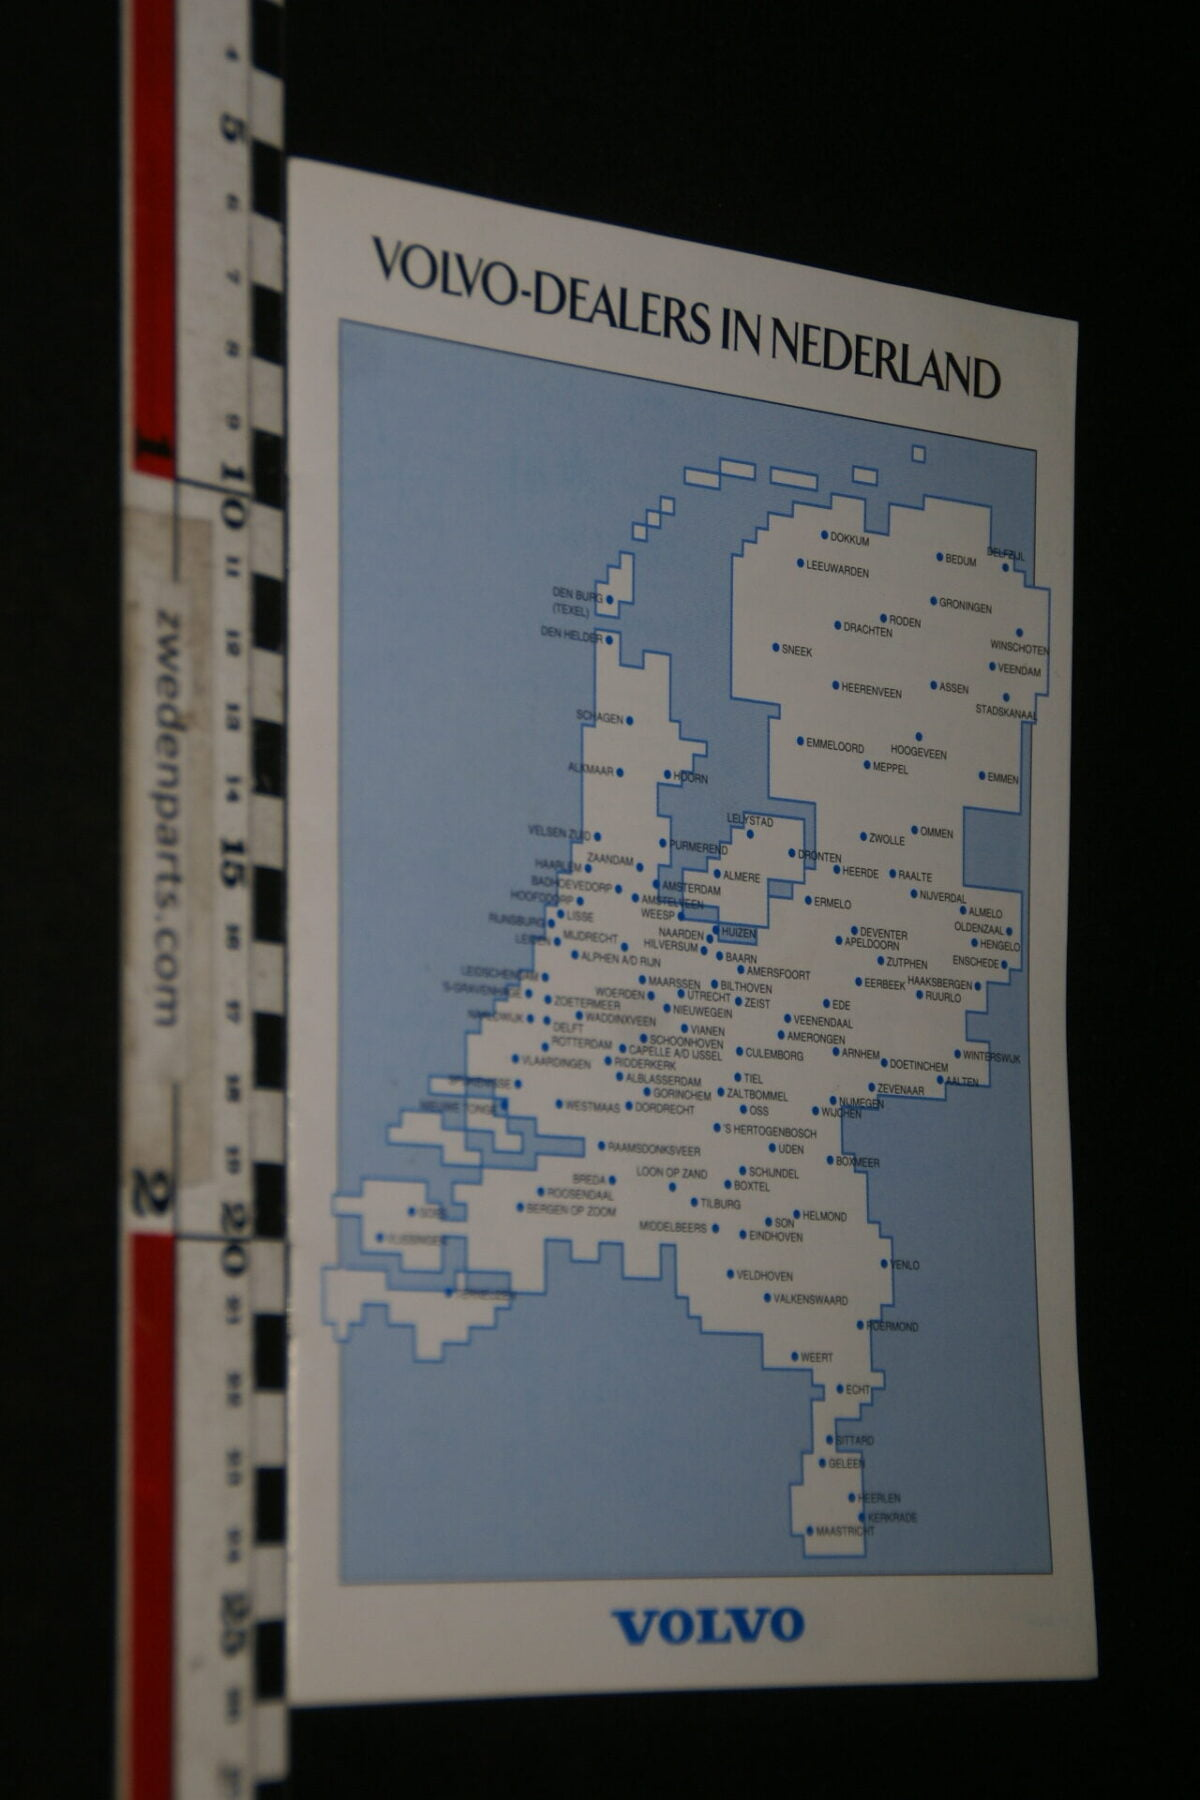 DSC06174 1995 brochure Volvo Dealers in Nederland, nr. Okt 9510-08-9cb55284